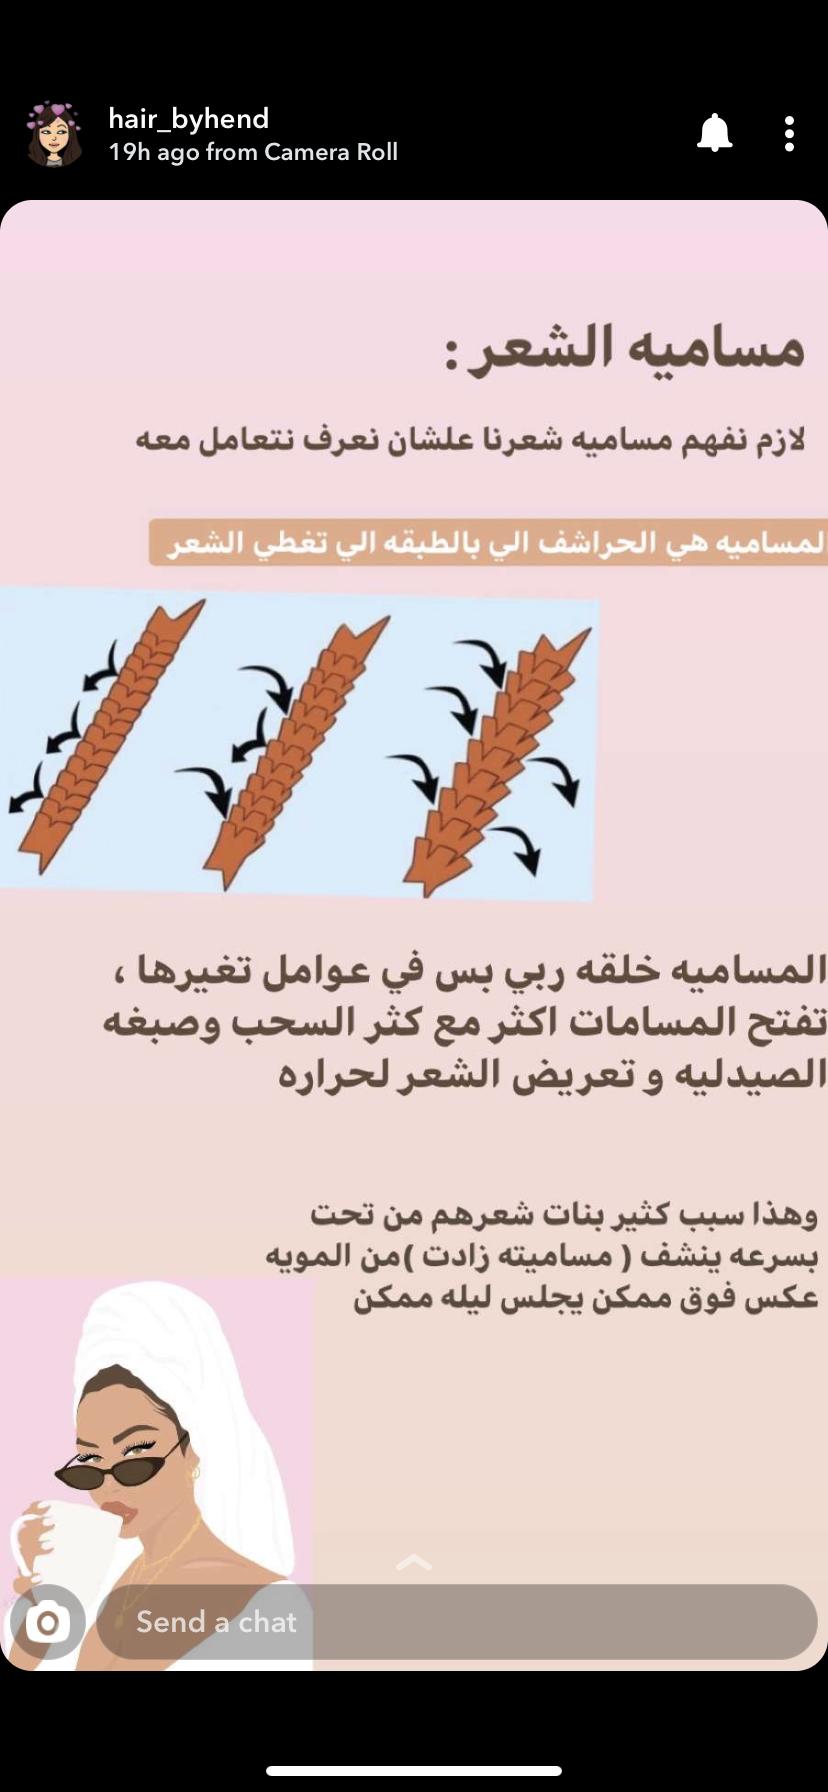 Pin By Bloggerista89 On Hair Care Styles العنايه بالشعر Beauty Hair Movie Posters